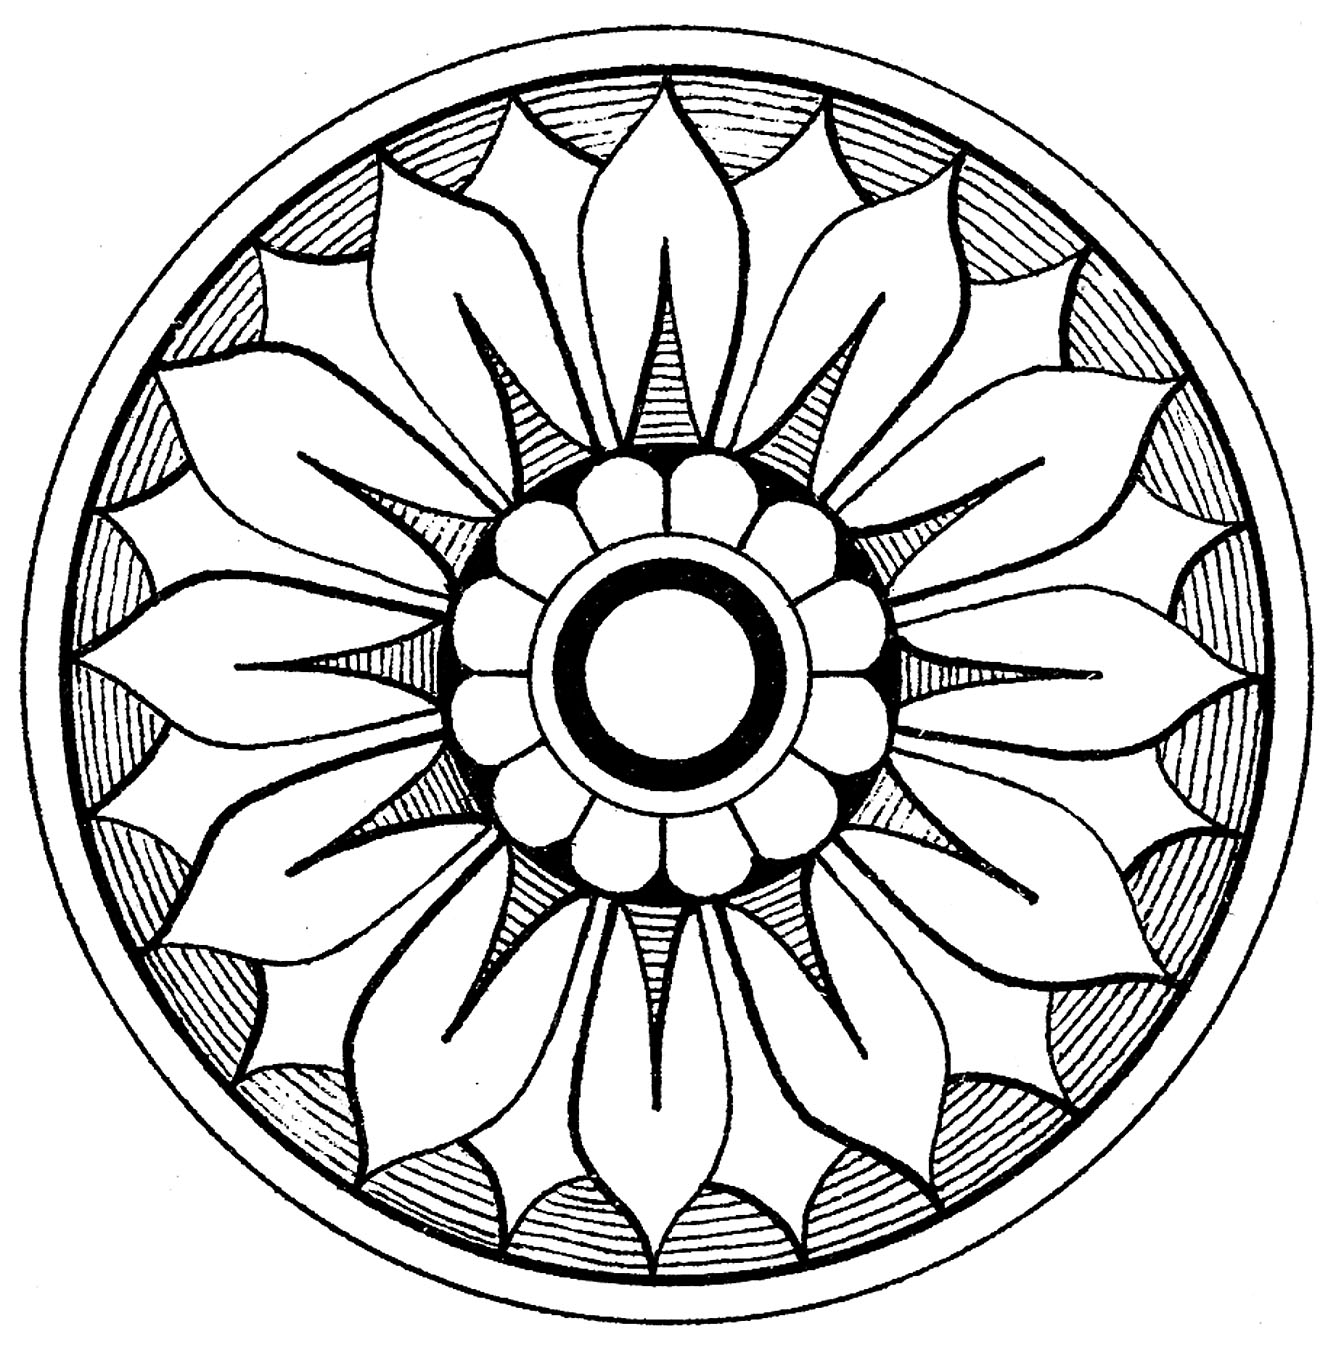 Ornamental Clip Art - Antique Medallions - The Graphics Fairy